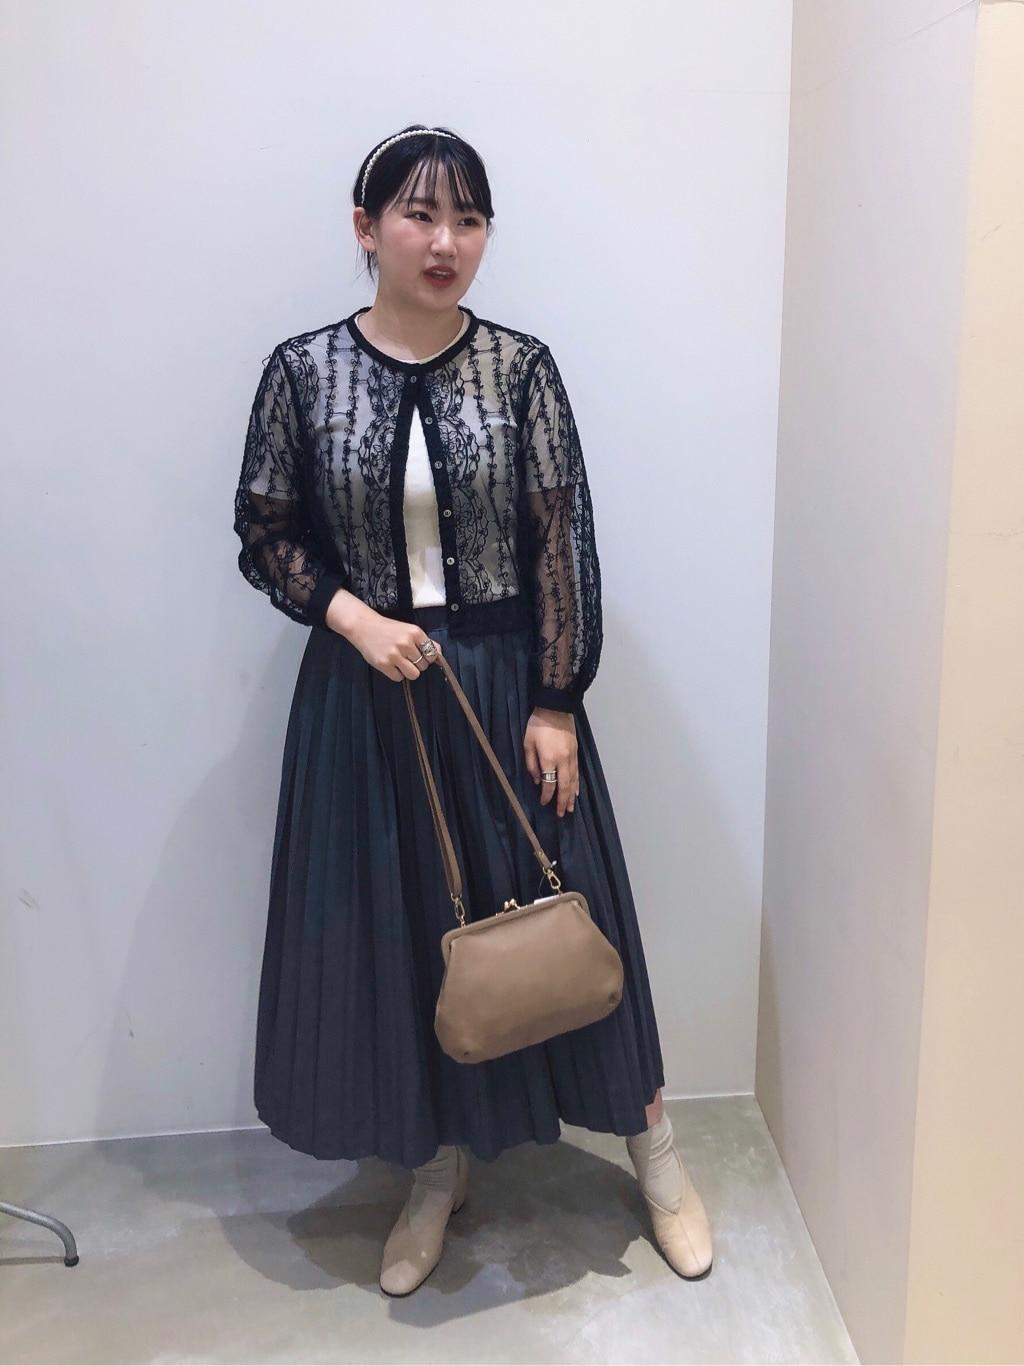 bulle de savon 阪急西宮ガーデンズ 身長:166cm 2020.09.02